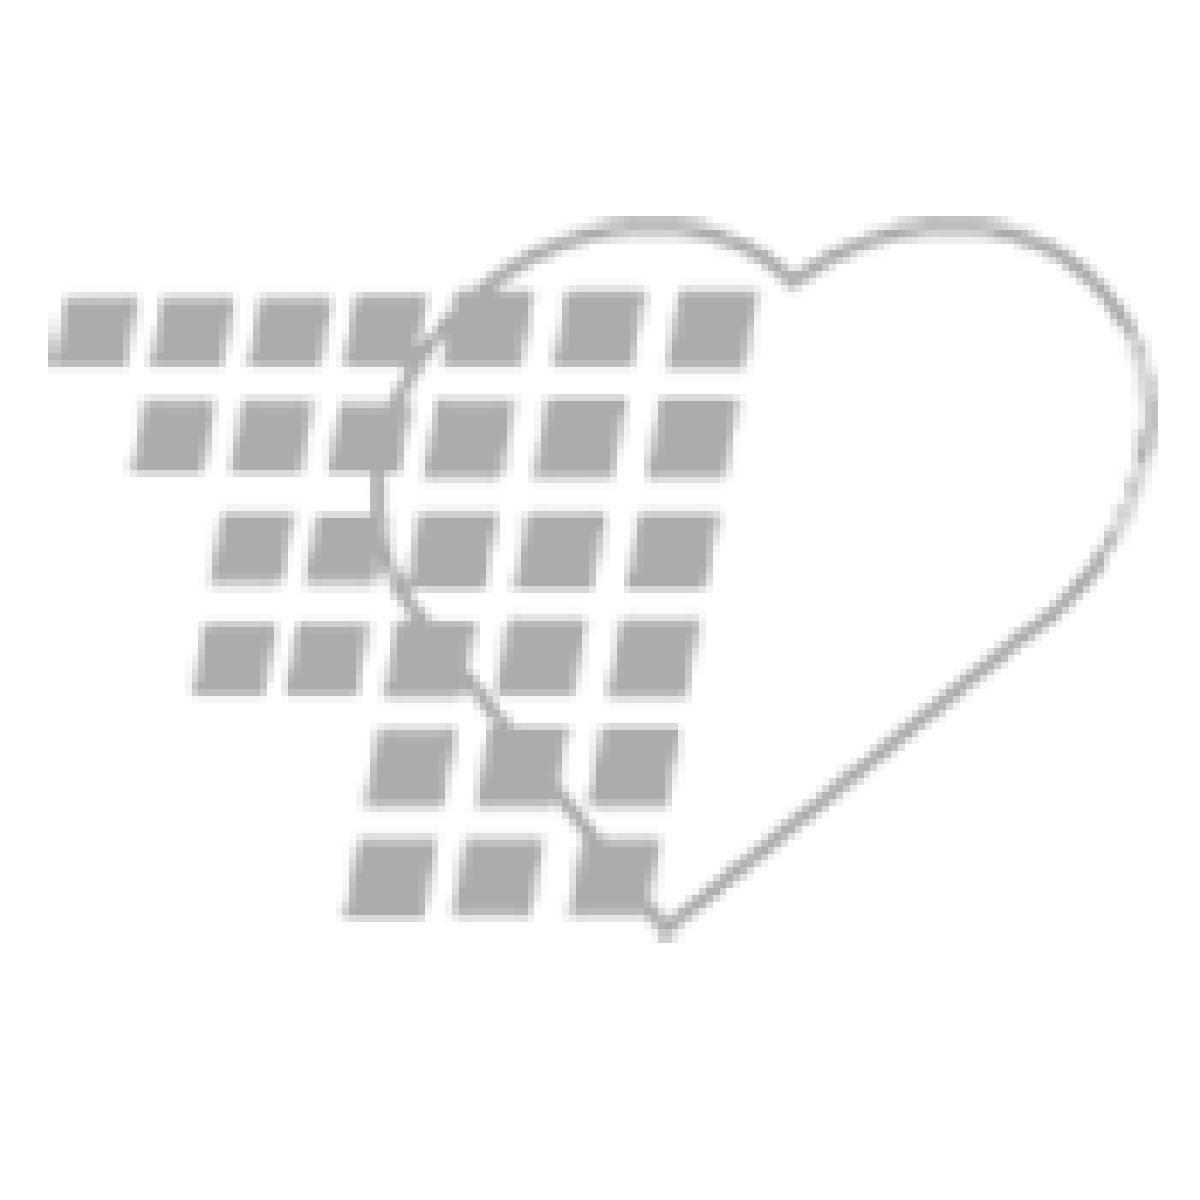 02-20-0731P Multikuf™ Portable 3 Cuff Sphyg Kit